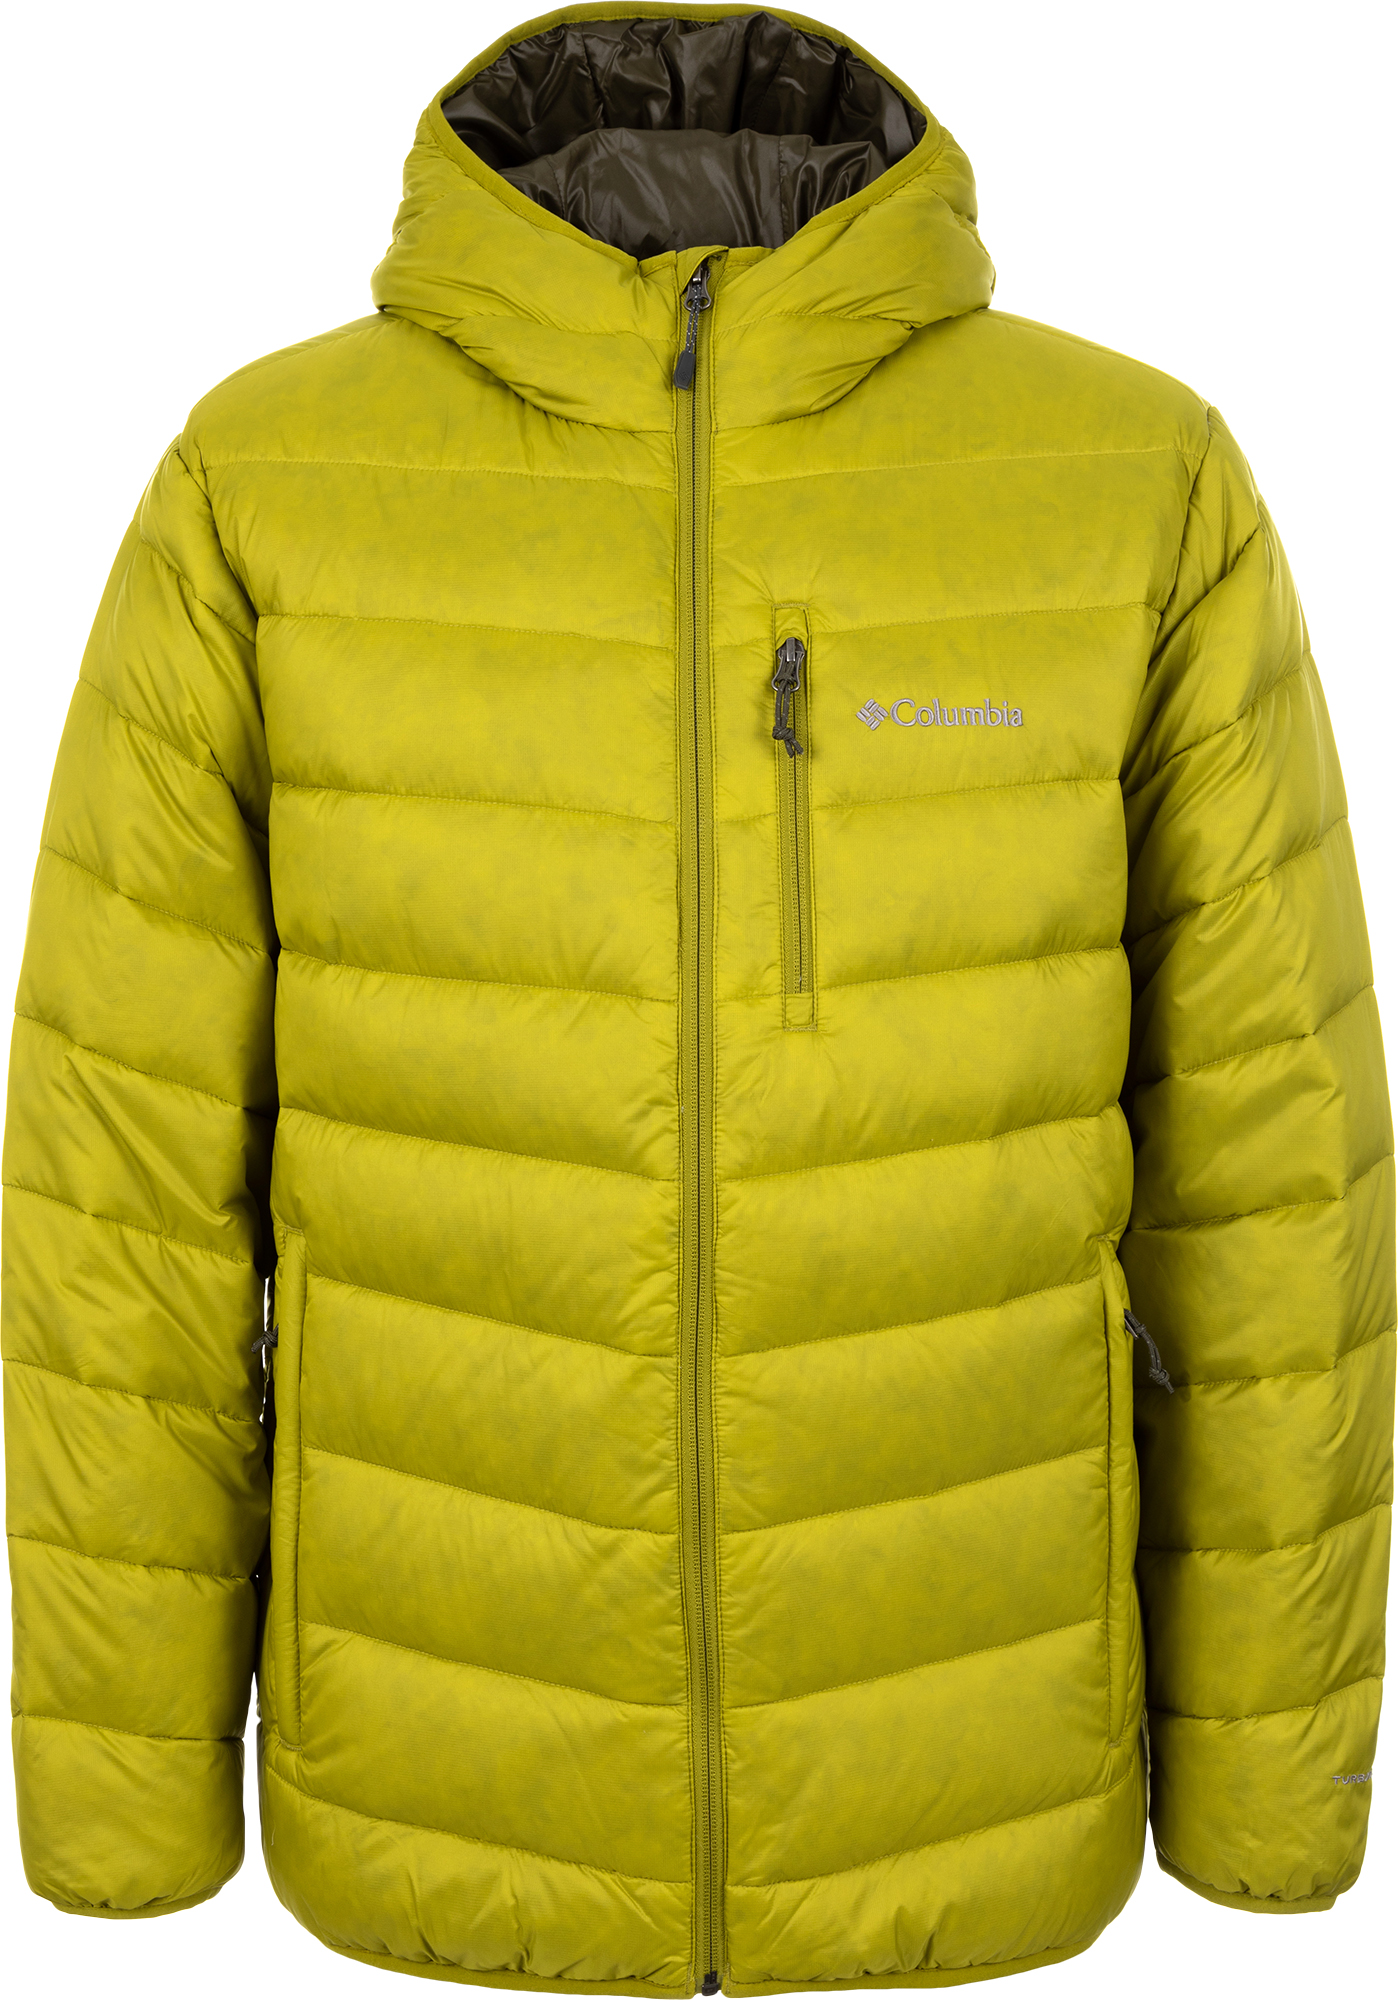 Columbia Куртка пуховая мужская Columbia Hellfire 650 TurboDown, размер 56-58 цена 2017